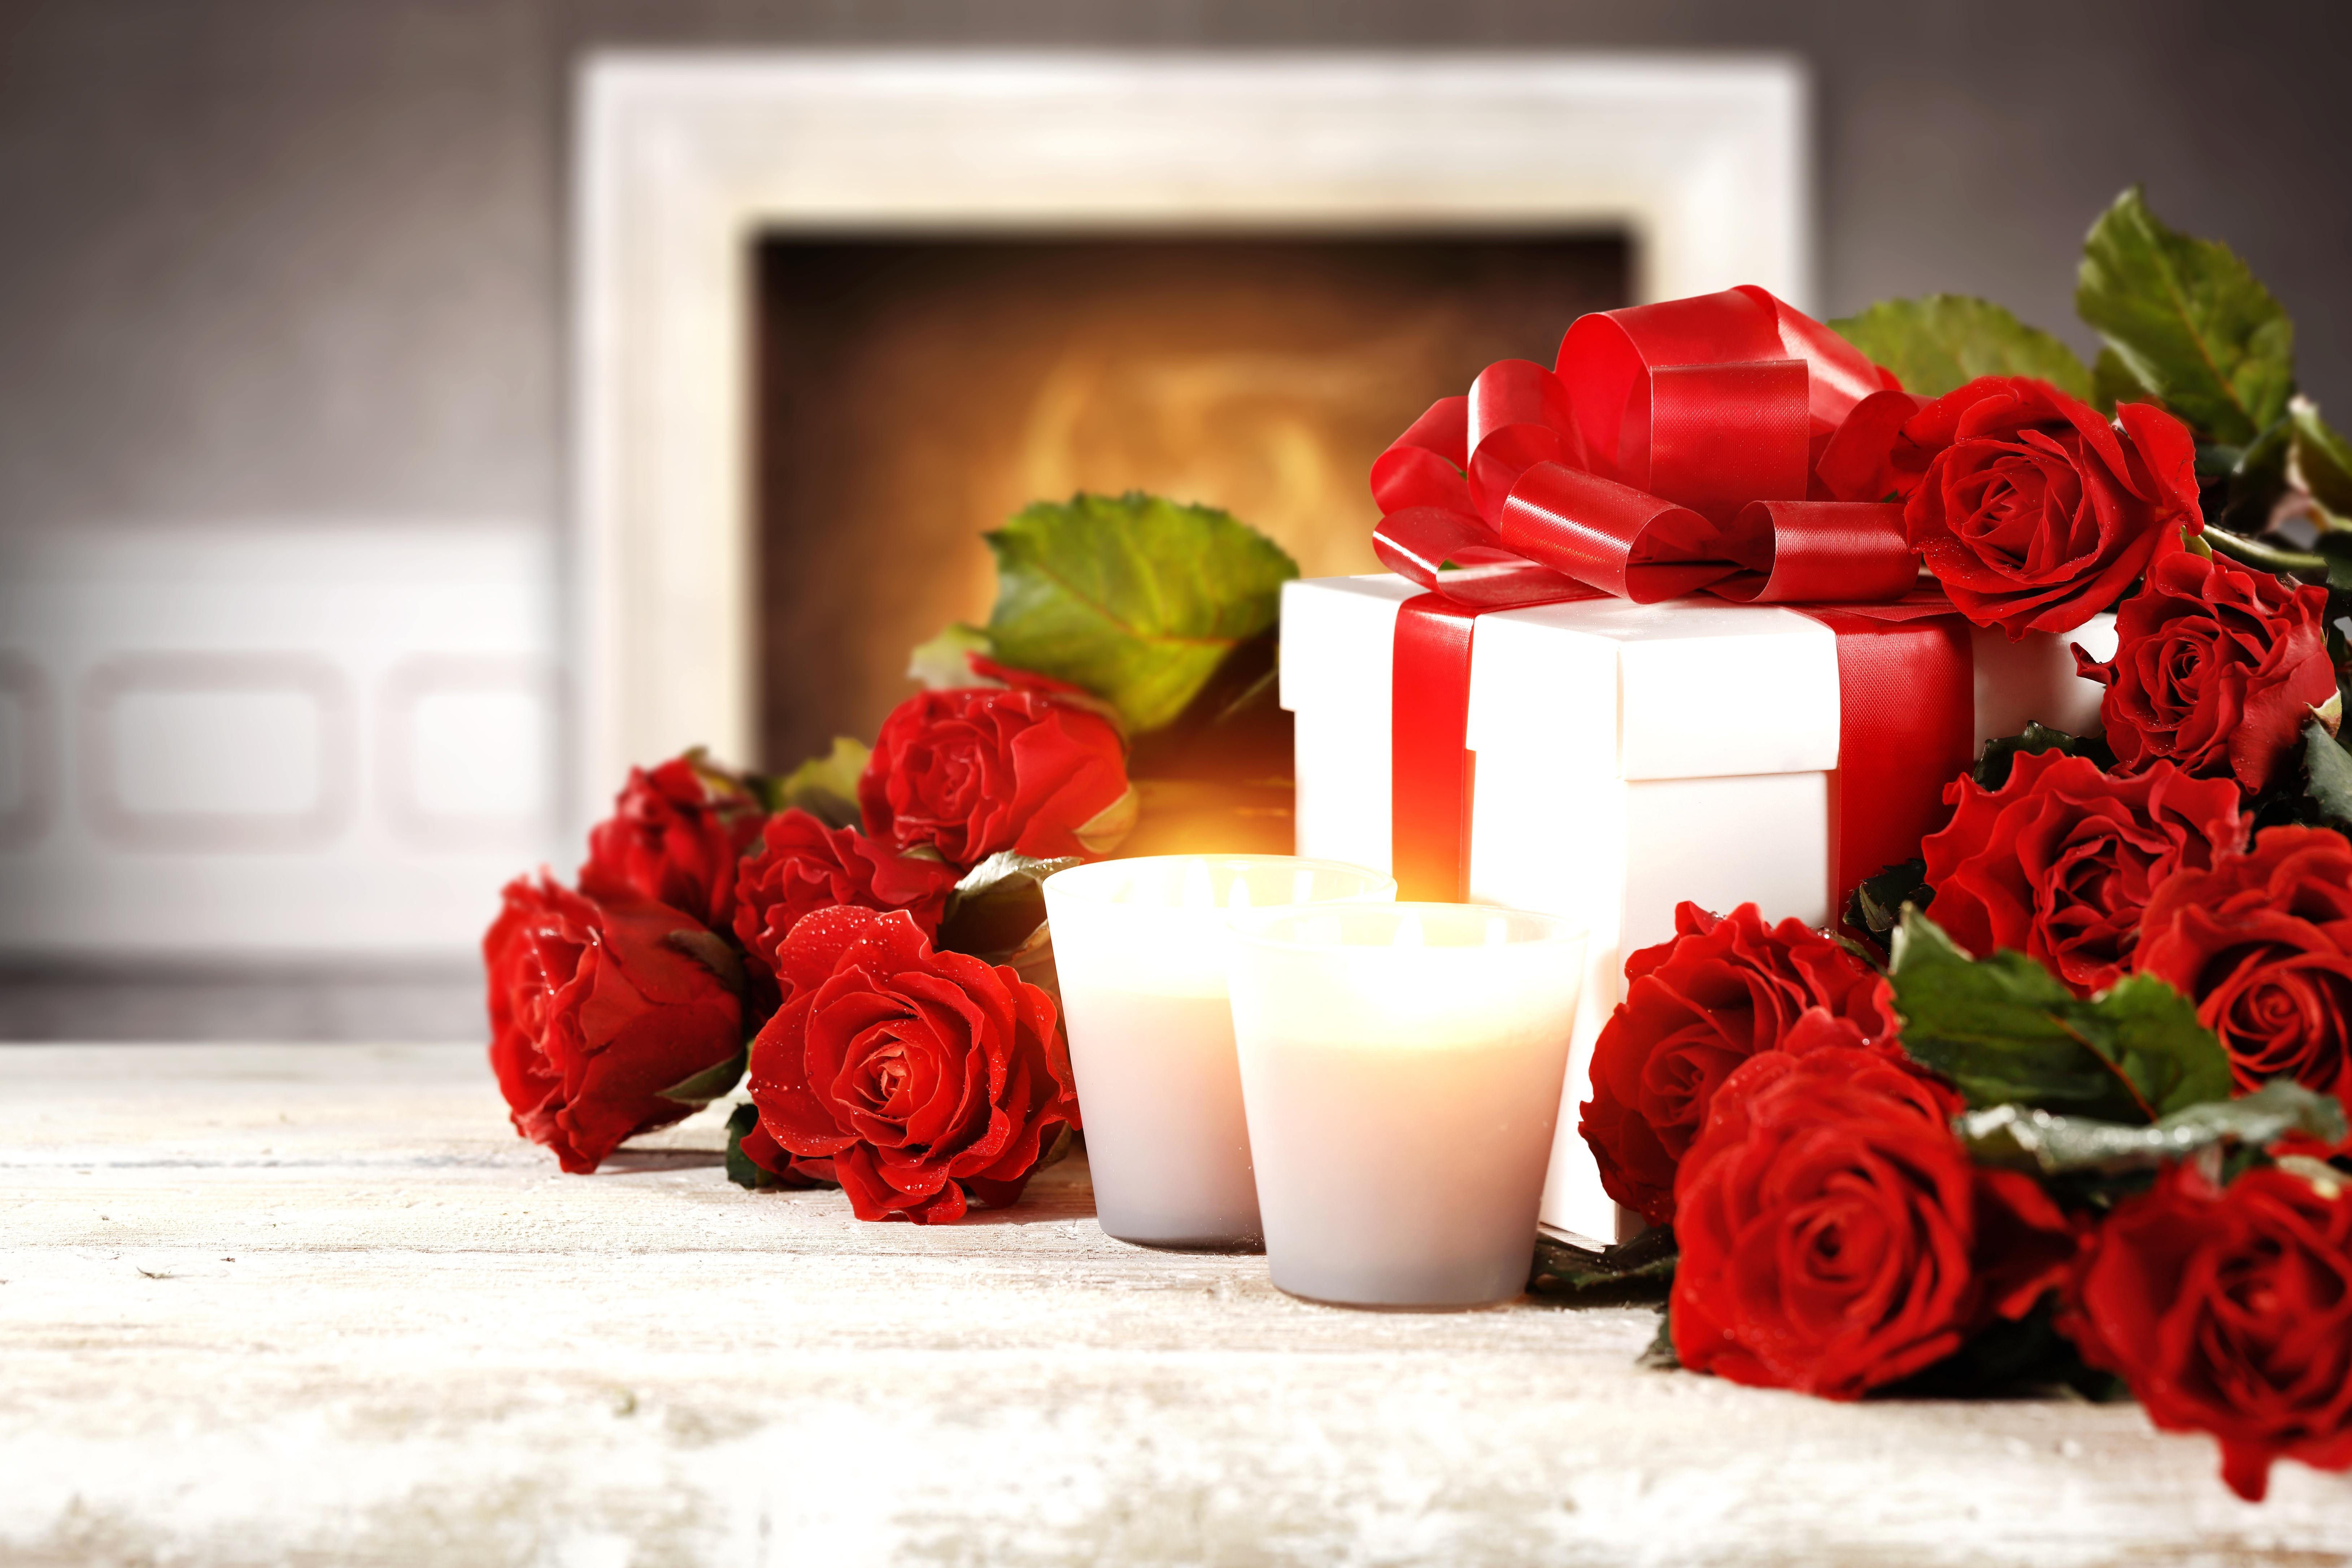 Открытки романтика с днем рождения, дня картинки